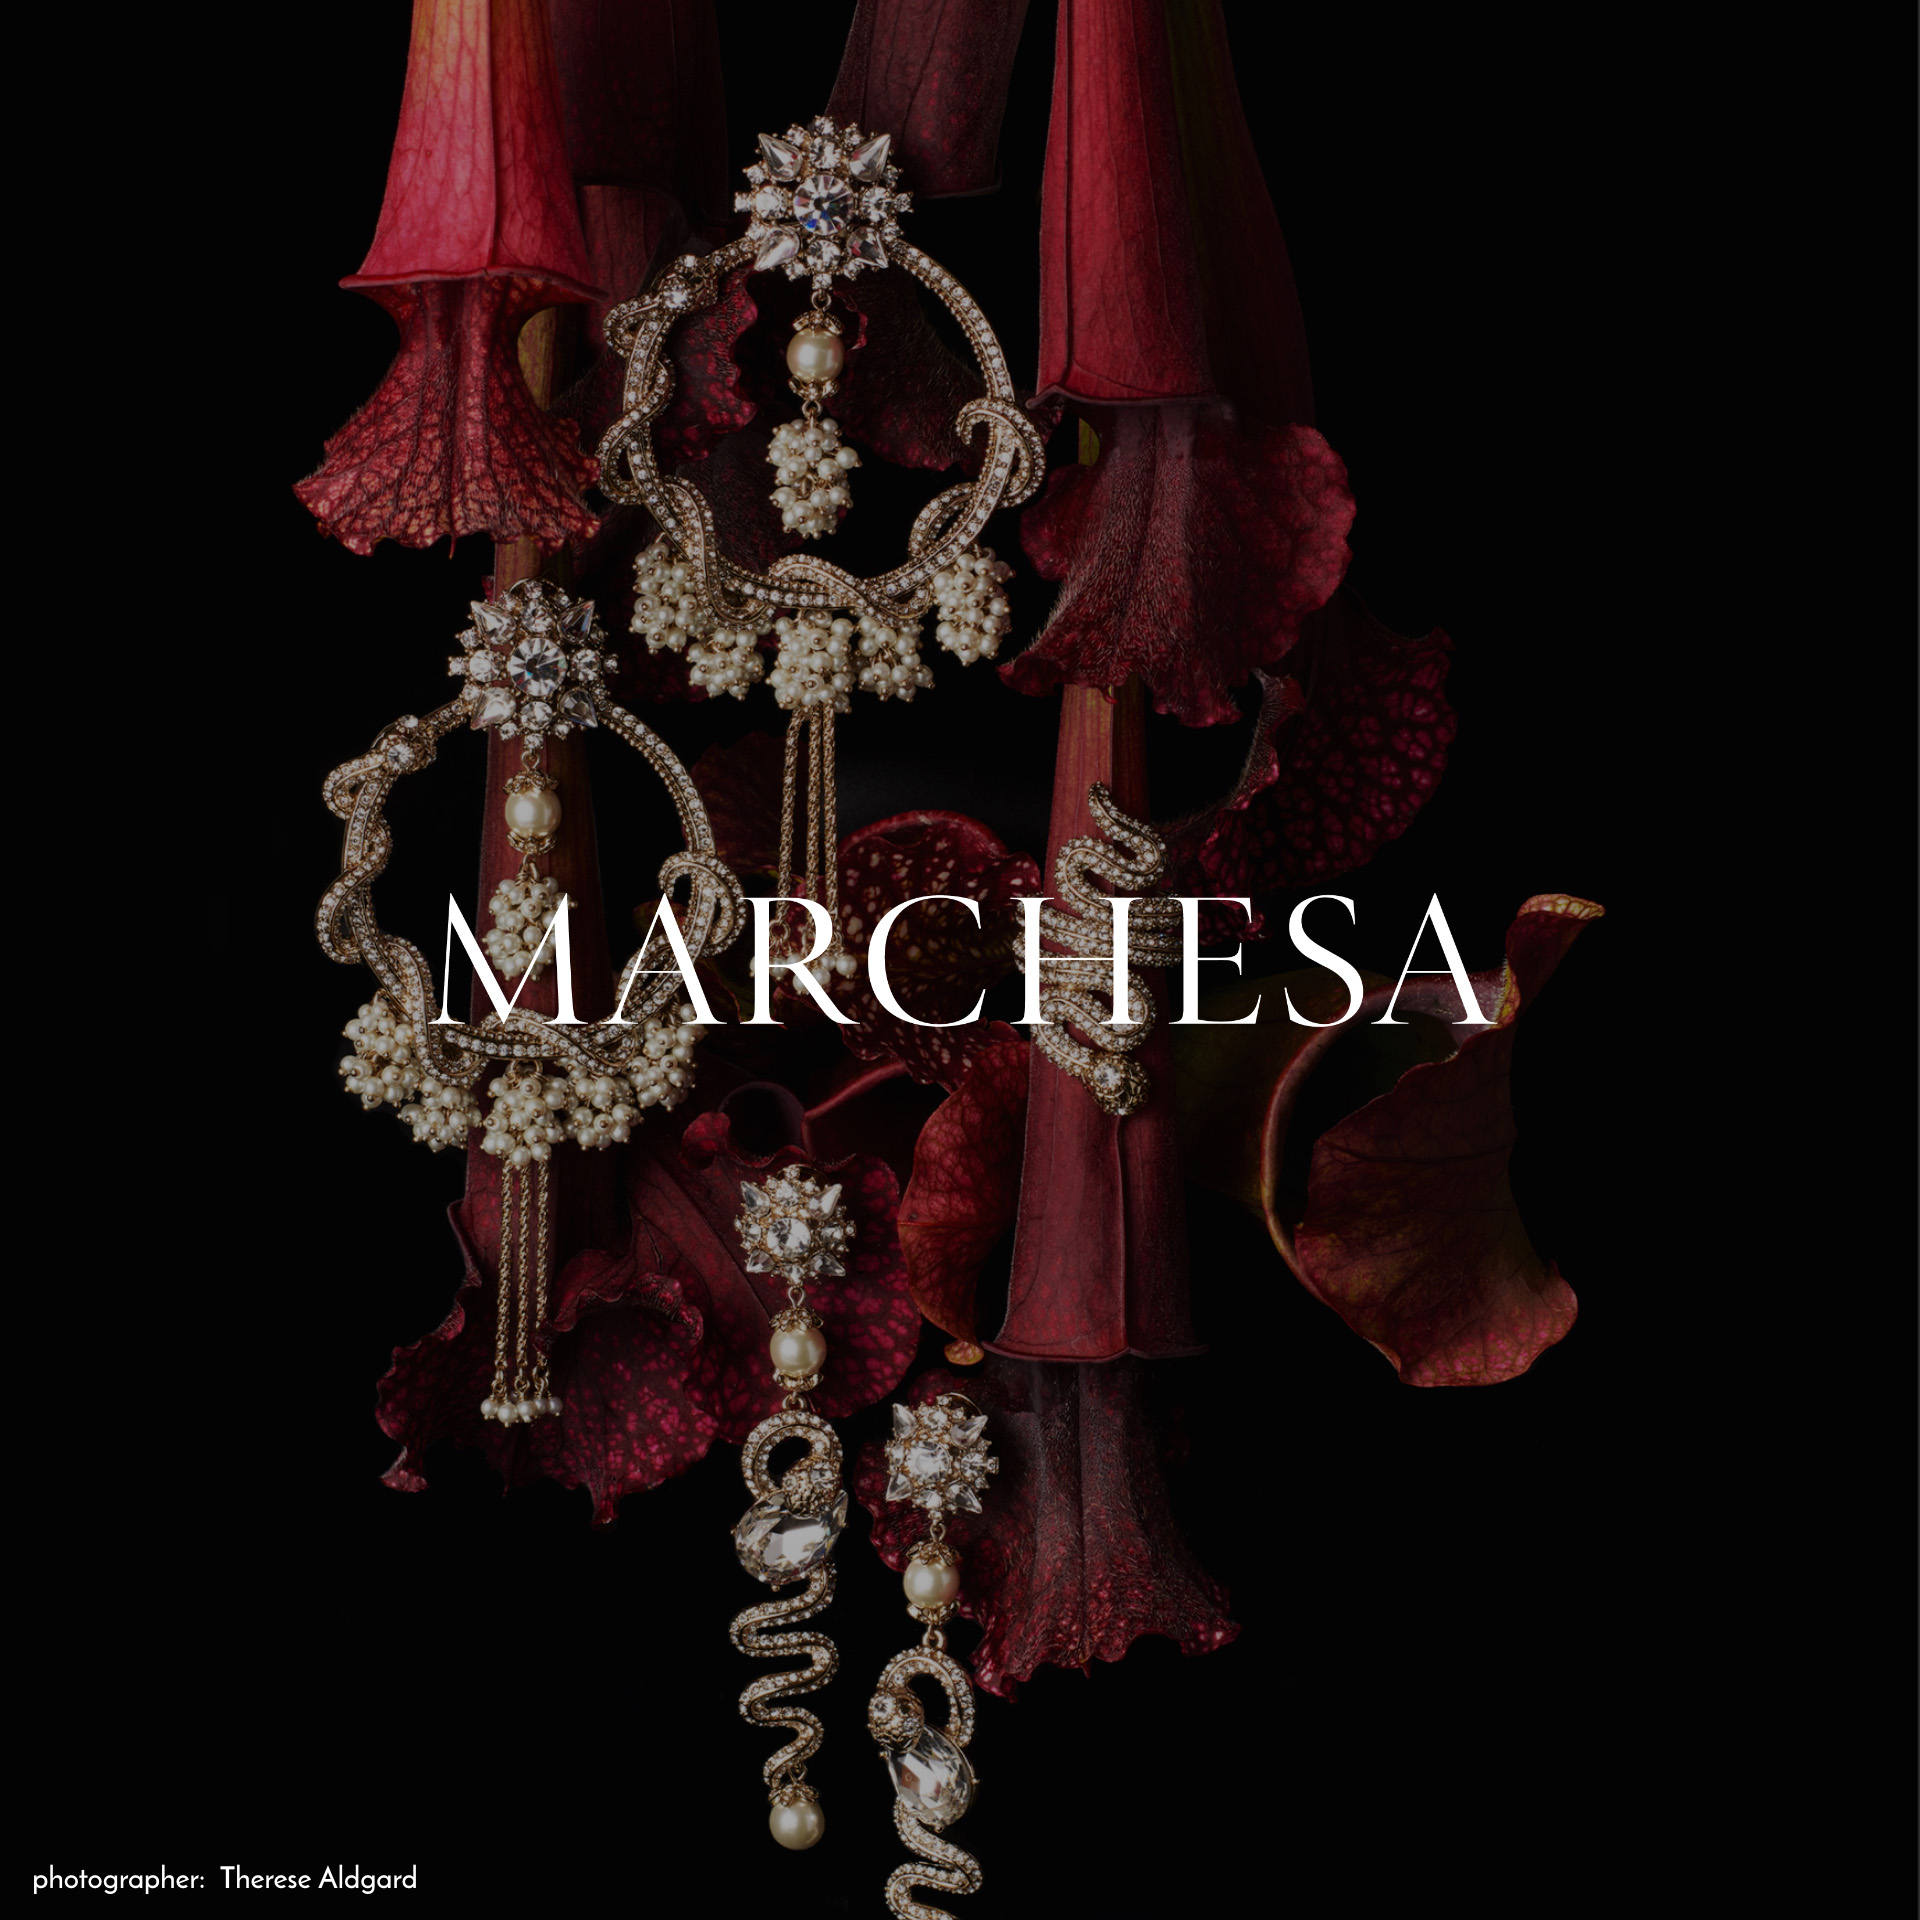 Brand logo of Marchesa